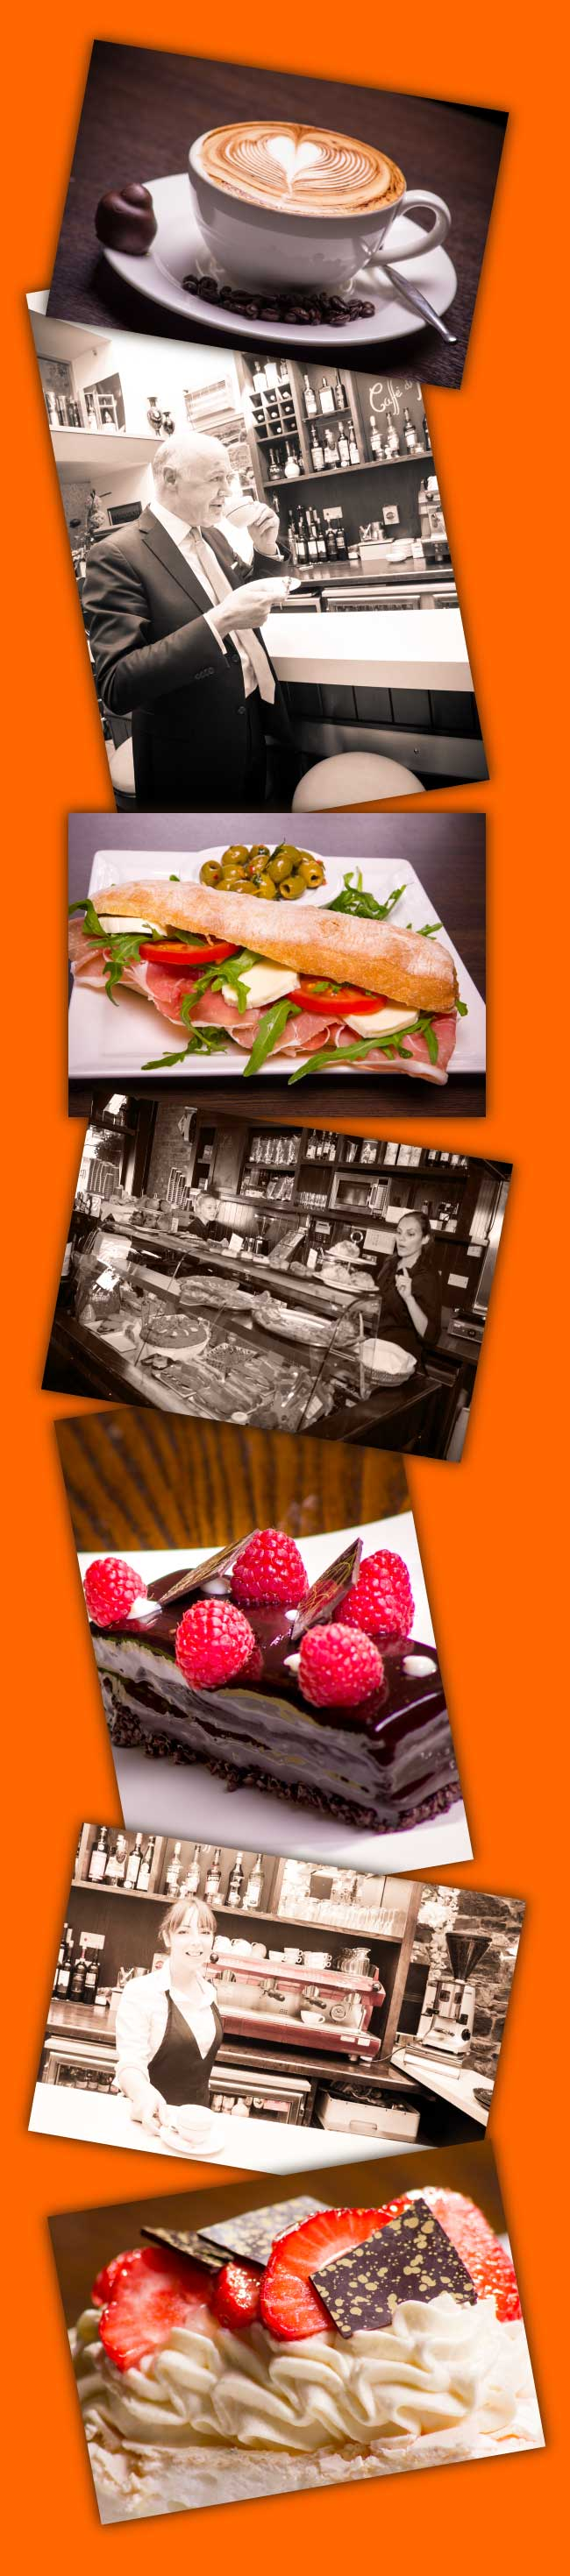 Italian Cafe Daytime